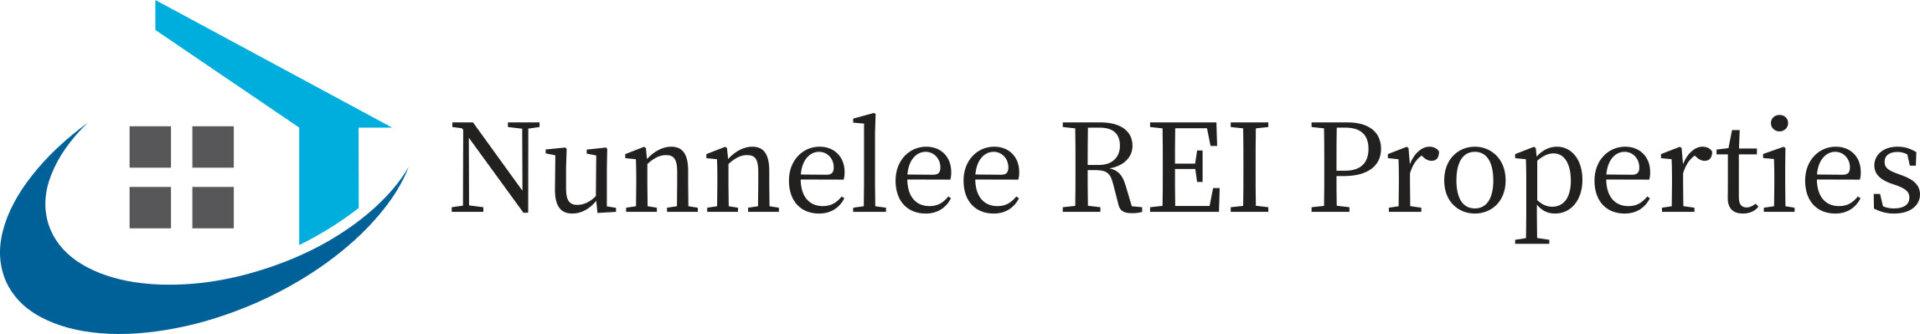 Nunnelee REI Properties  logo